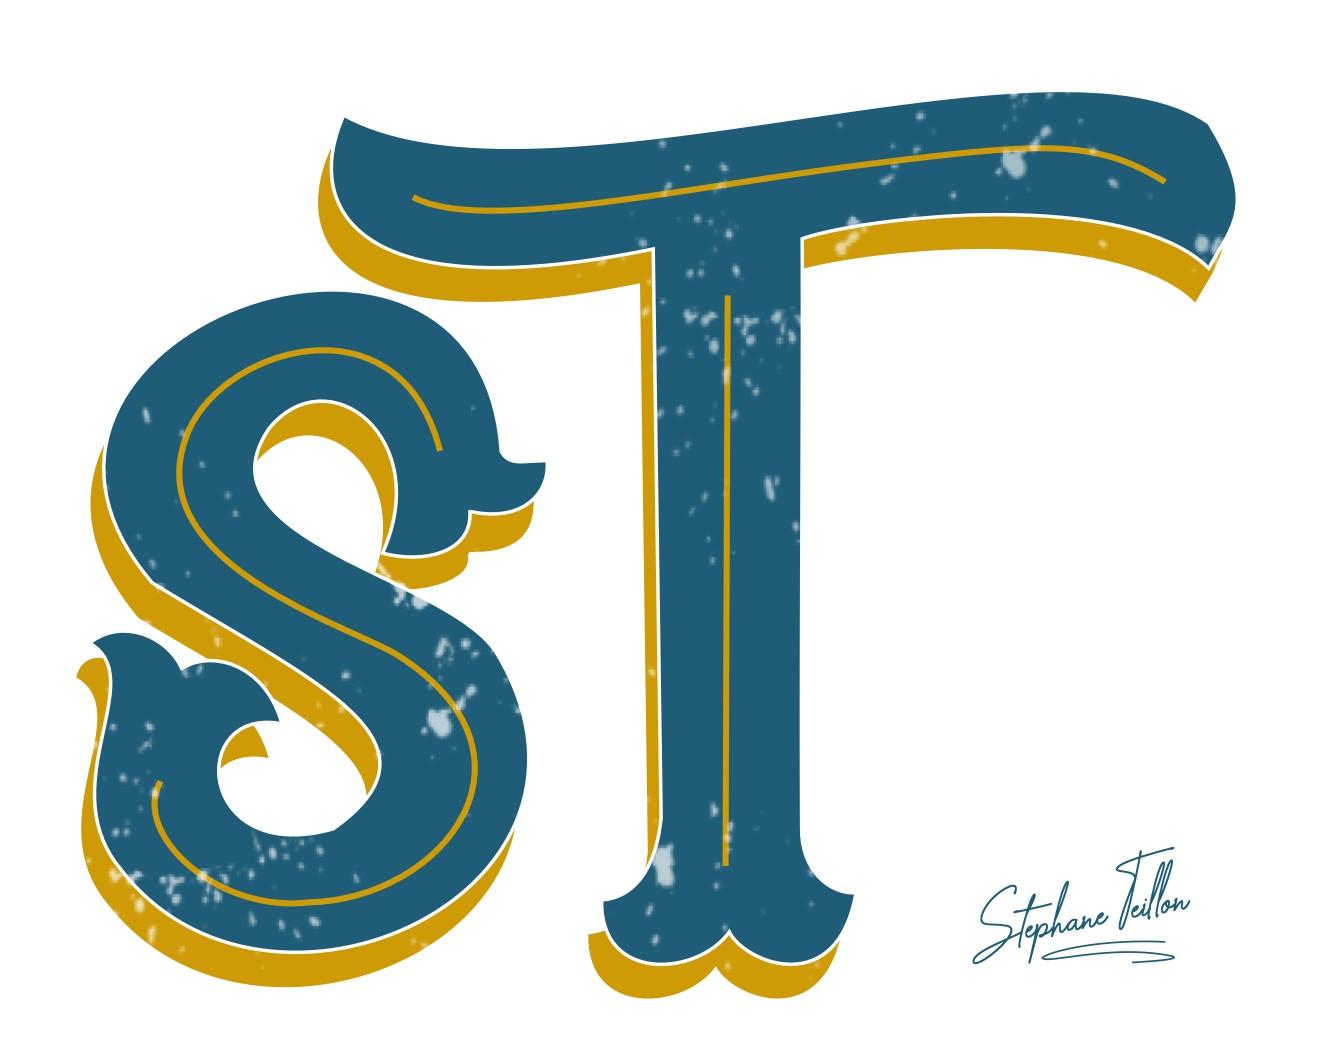 o2style stéphane teillon logo